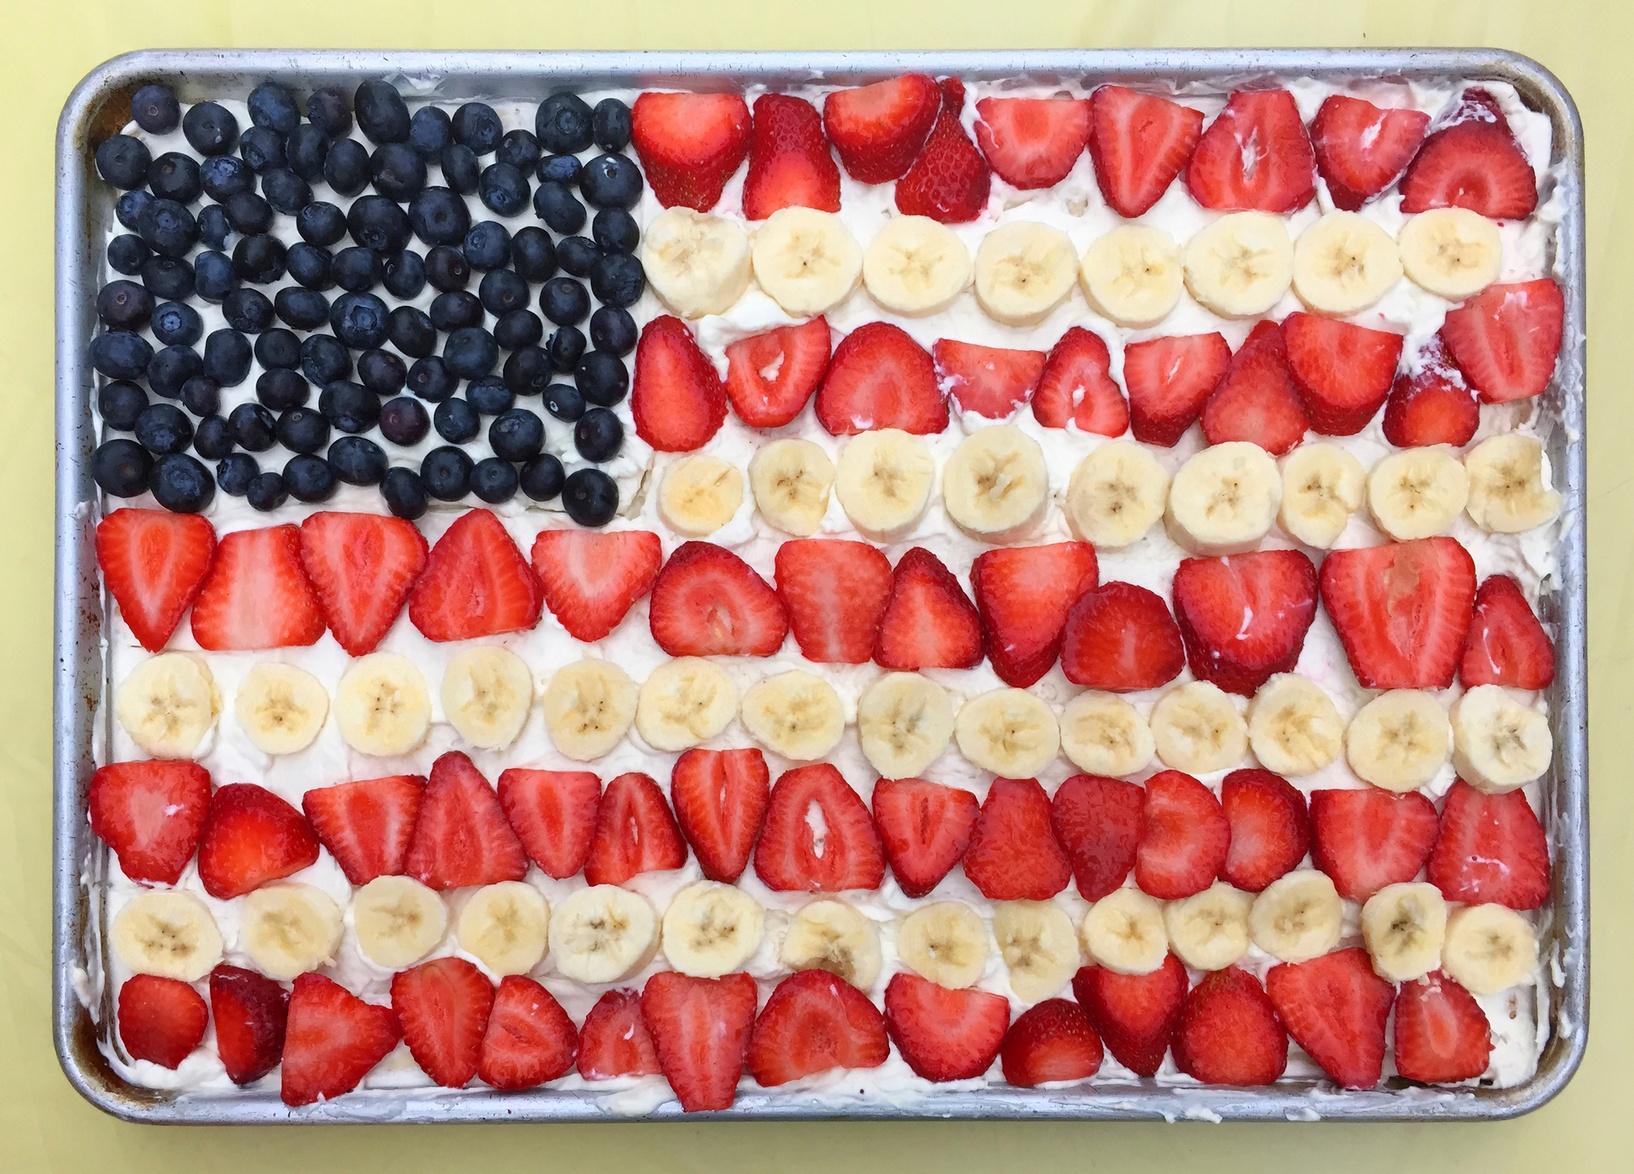 fruit_cake_4th_july_iStock_82326547_MEDIUM.jpg